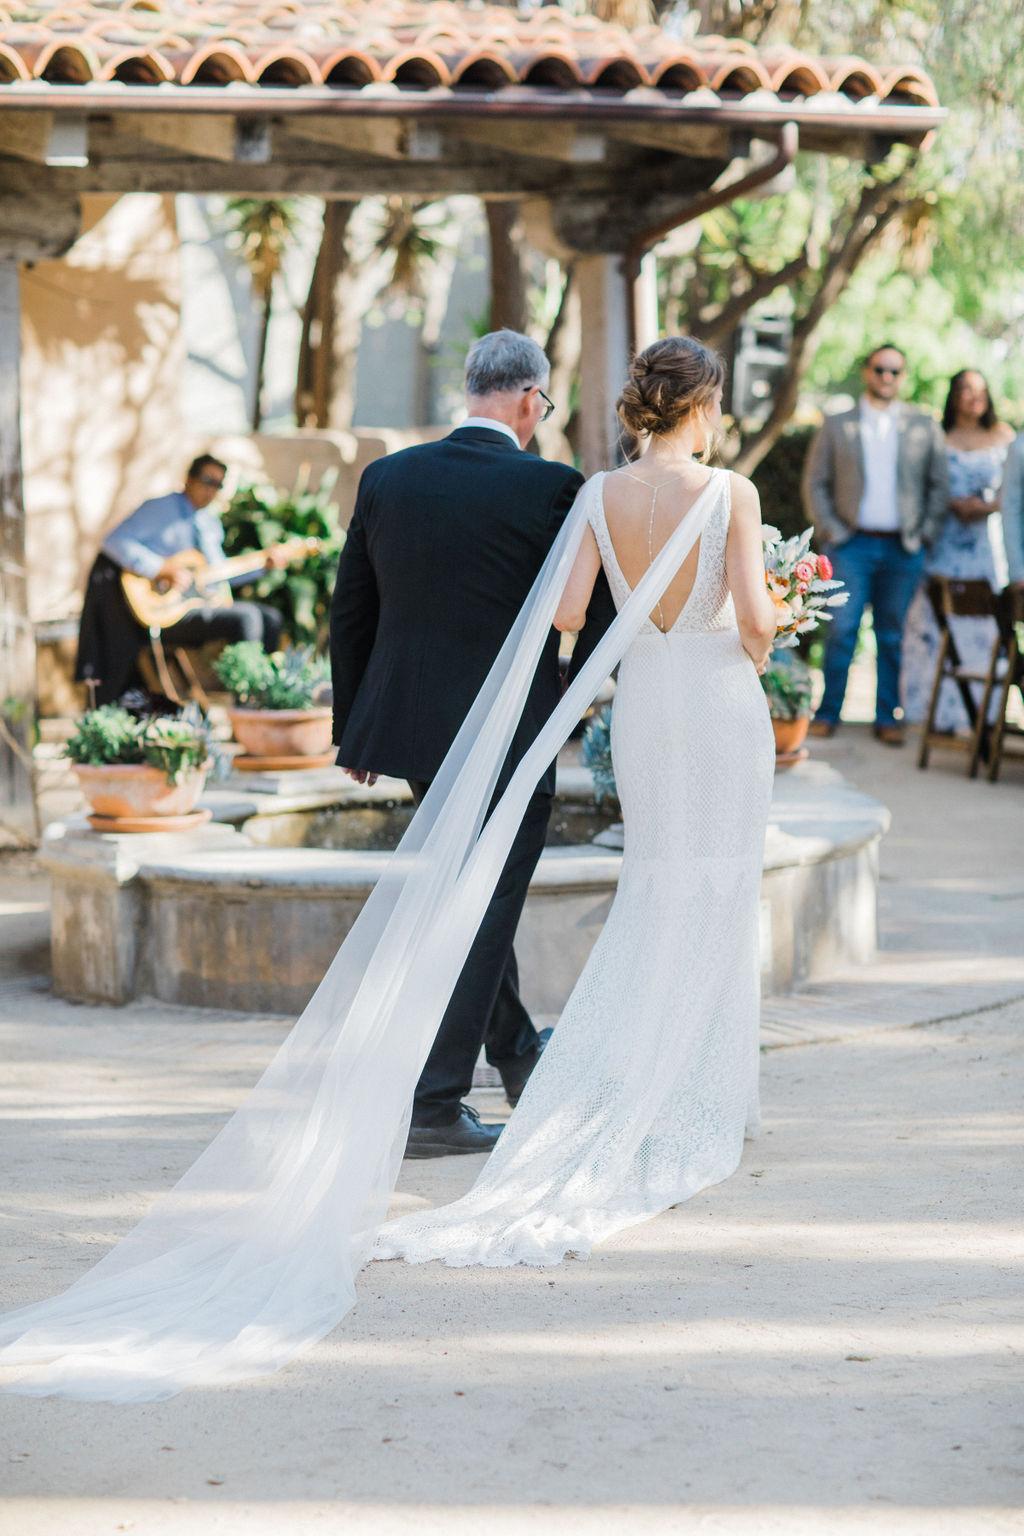 bride+sbhm+ceremony+0025-MichaelandAnnaCostaPhotography.JPG